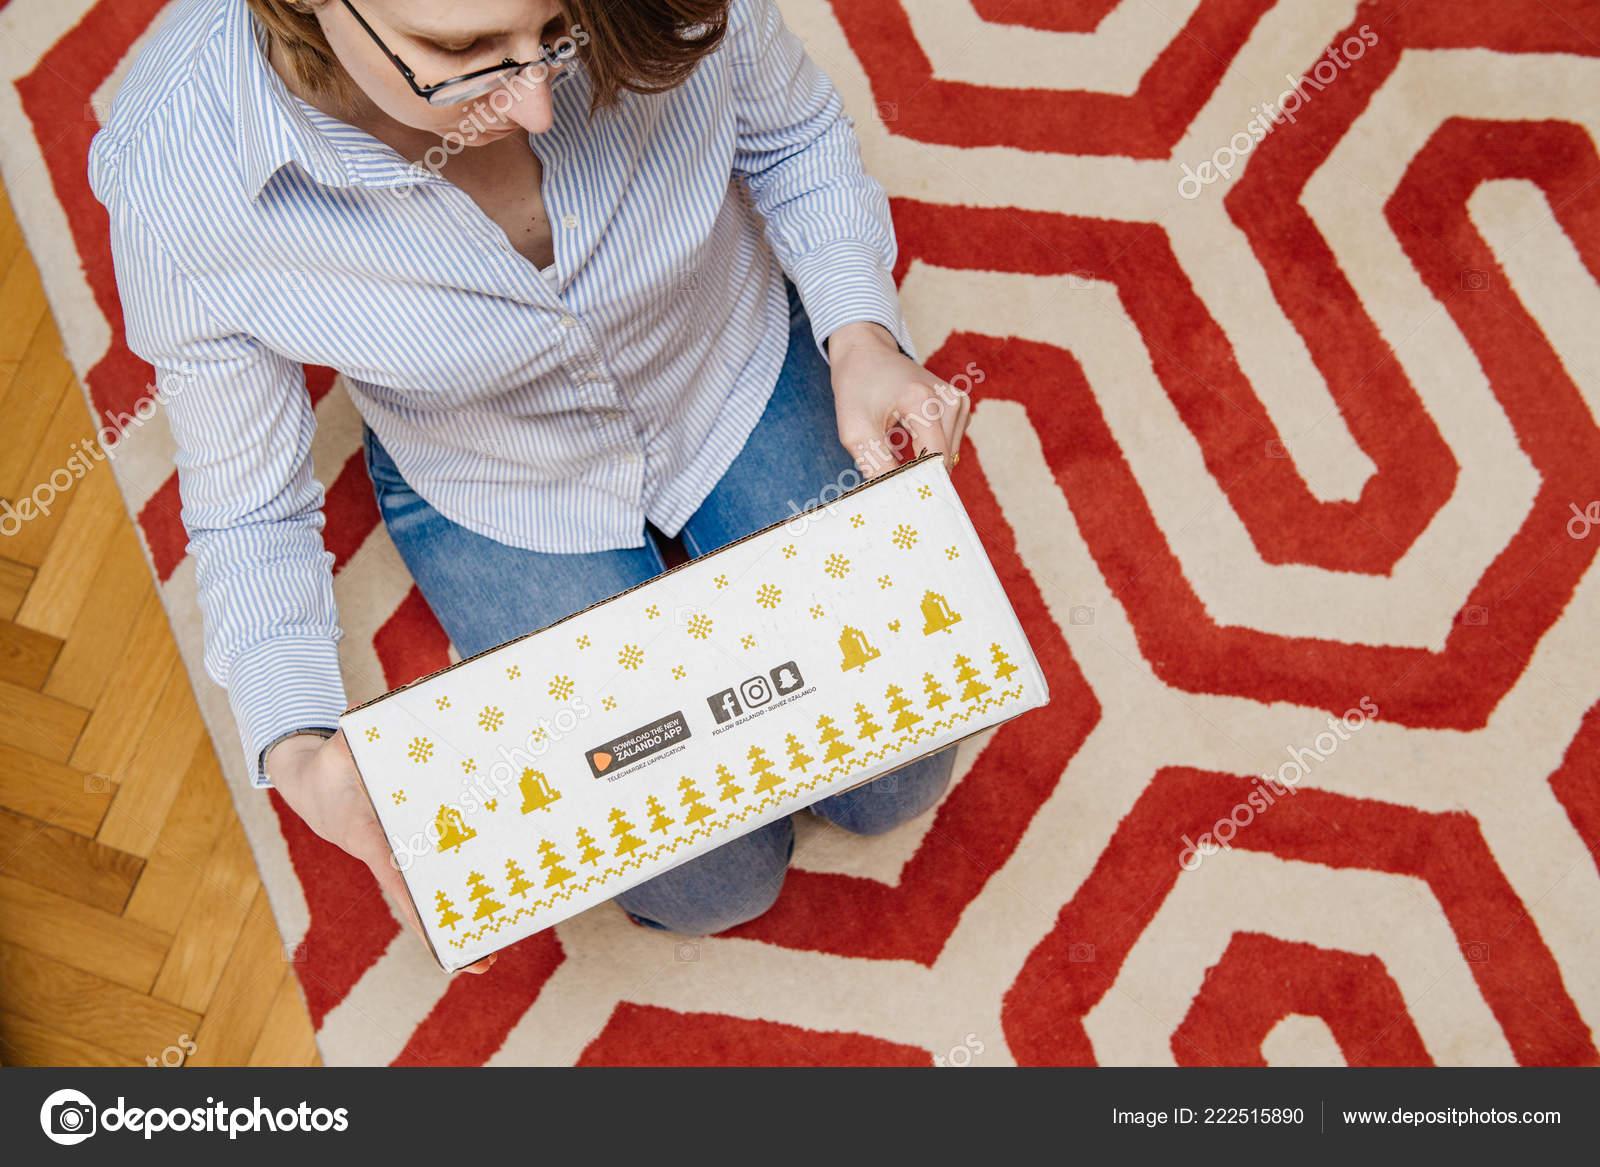 40a7a8d6f8 Γυναίκα αποσυσκευασία δέμα από Zalando μόδας κατάστημα– Εκδοτικές Φωτογραφίες  Αρχείου